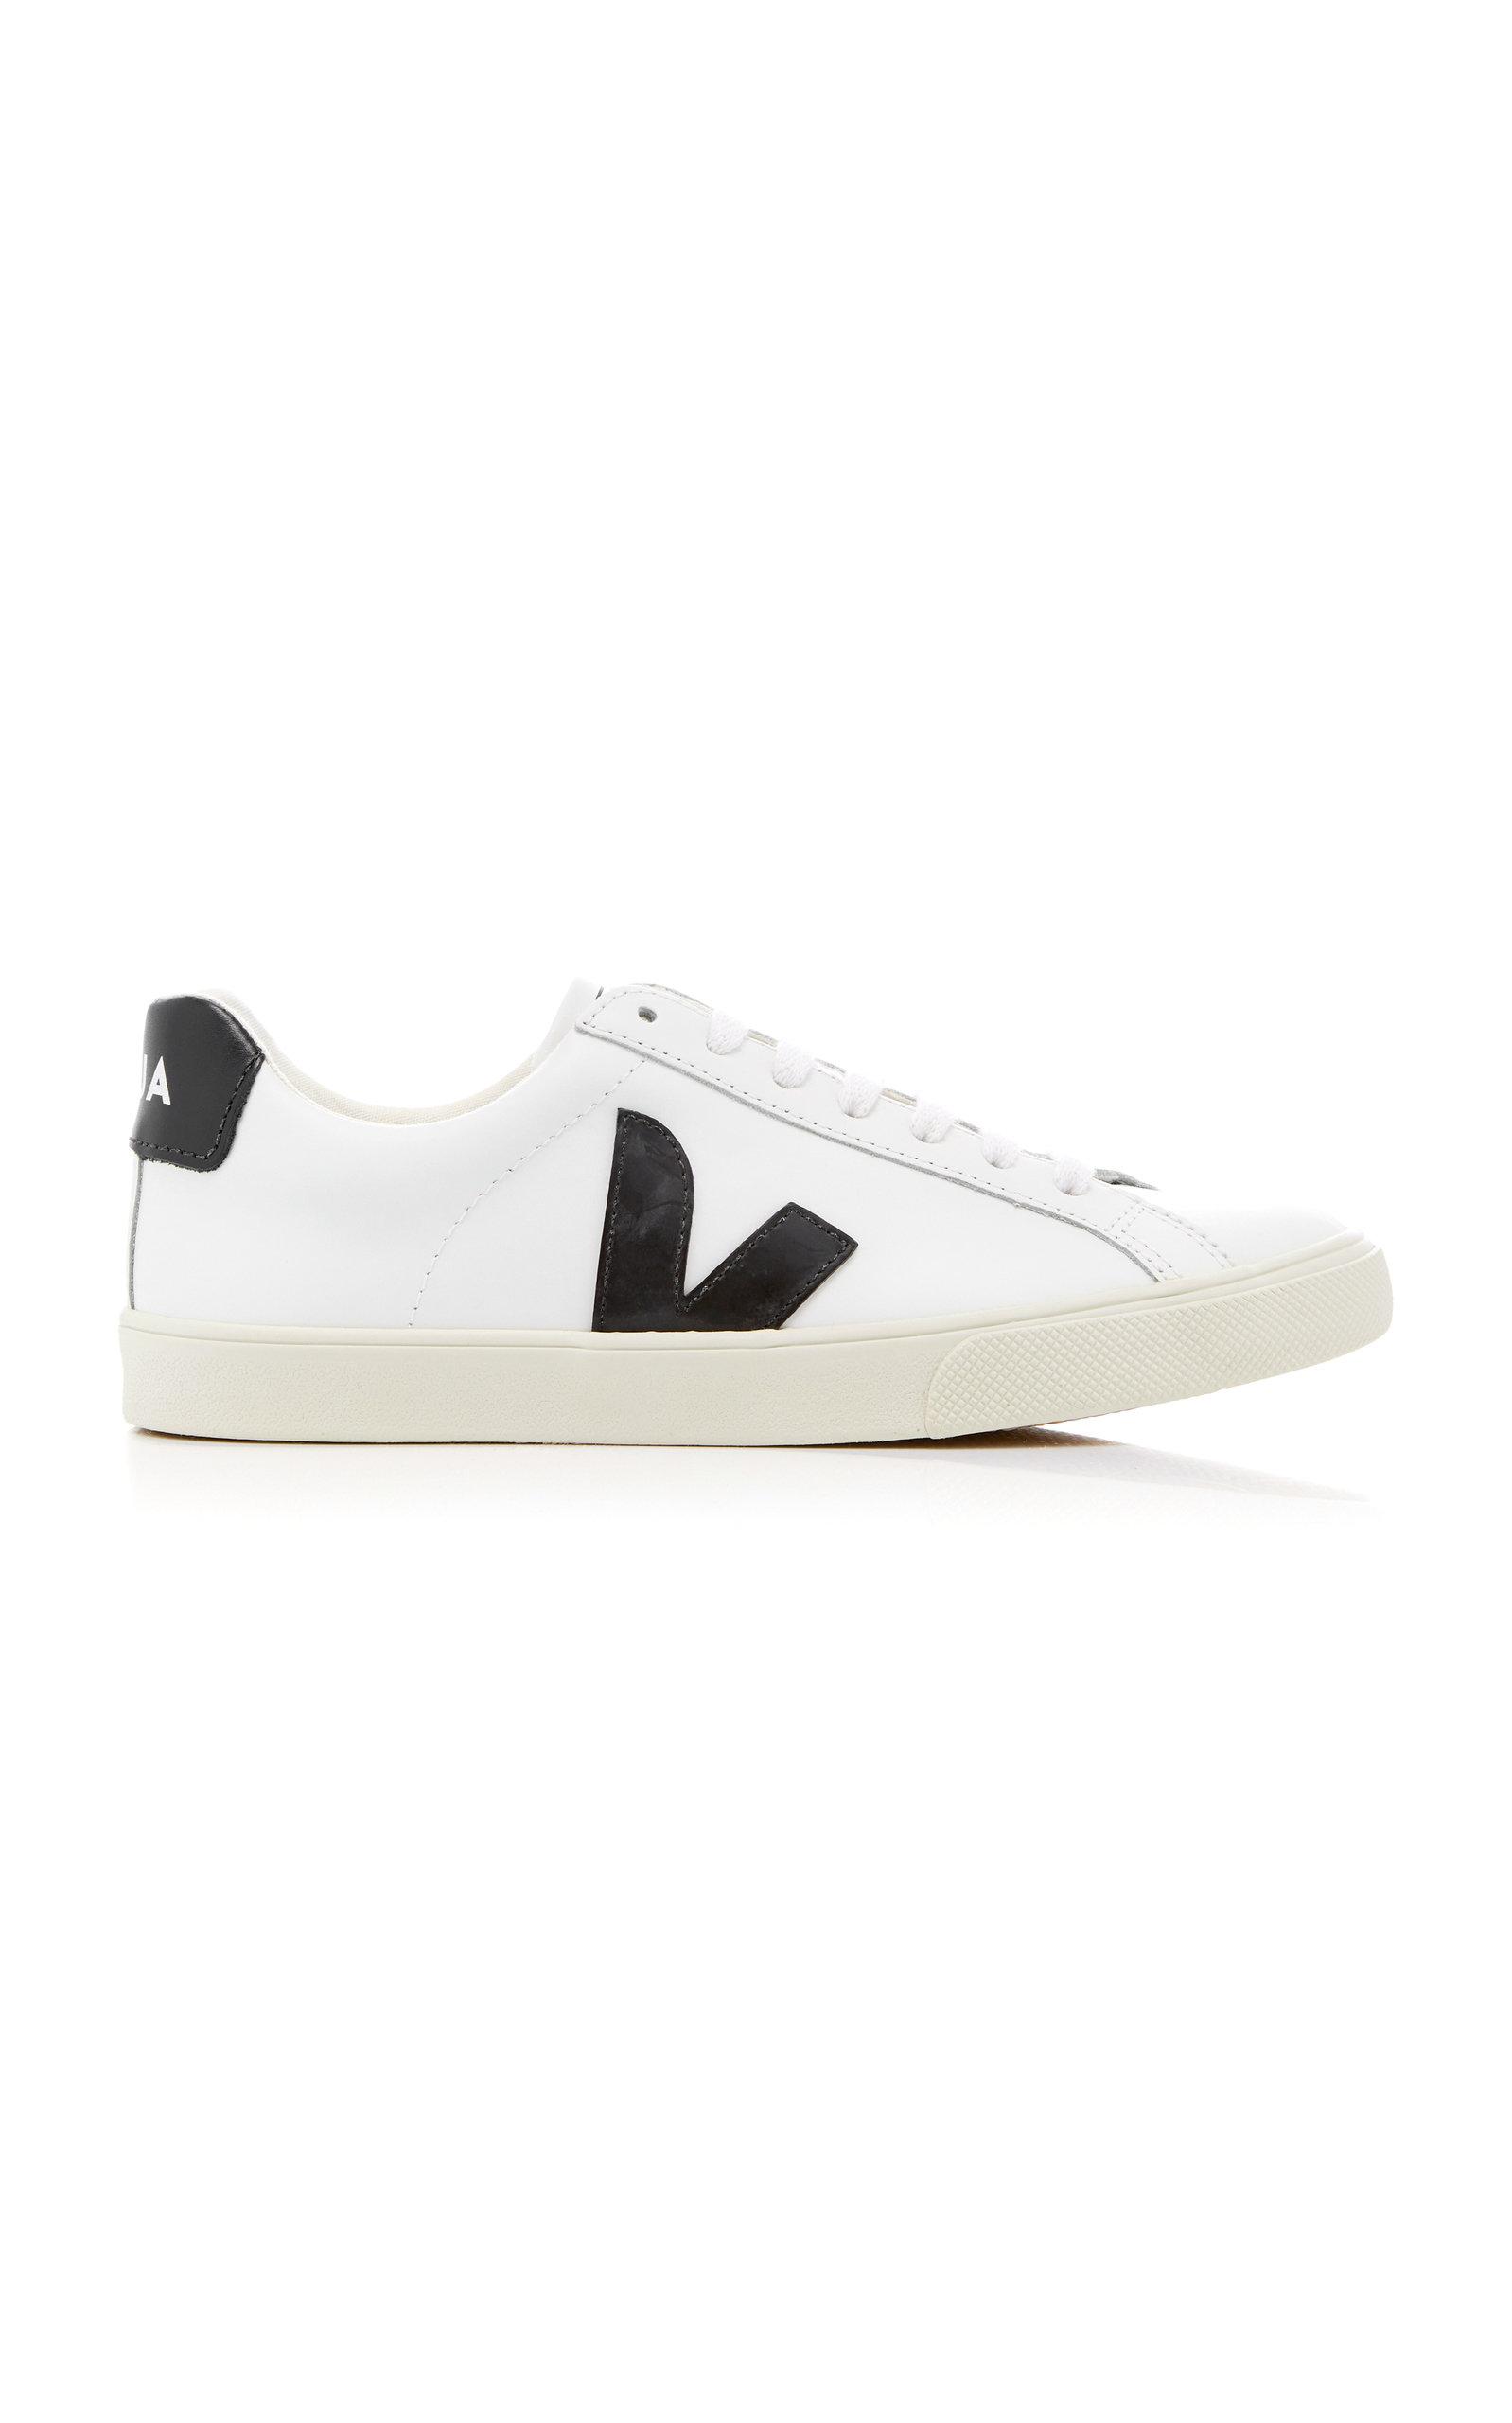 Sneaker En Cuir Espar Voir wA4K1